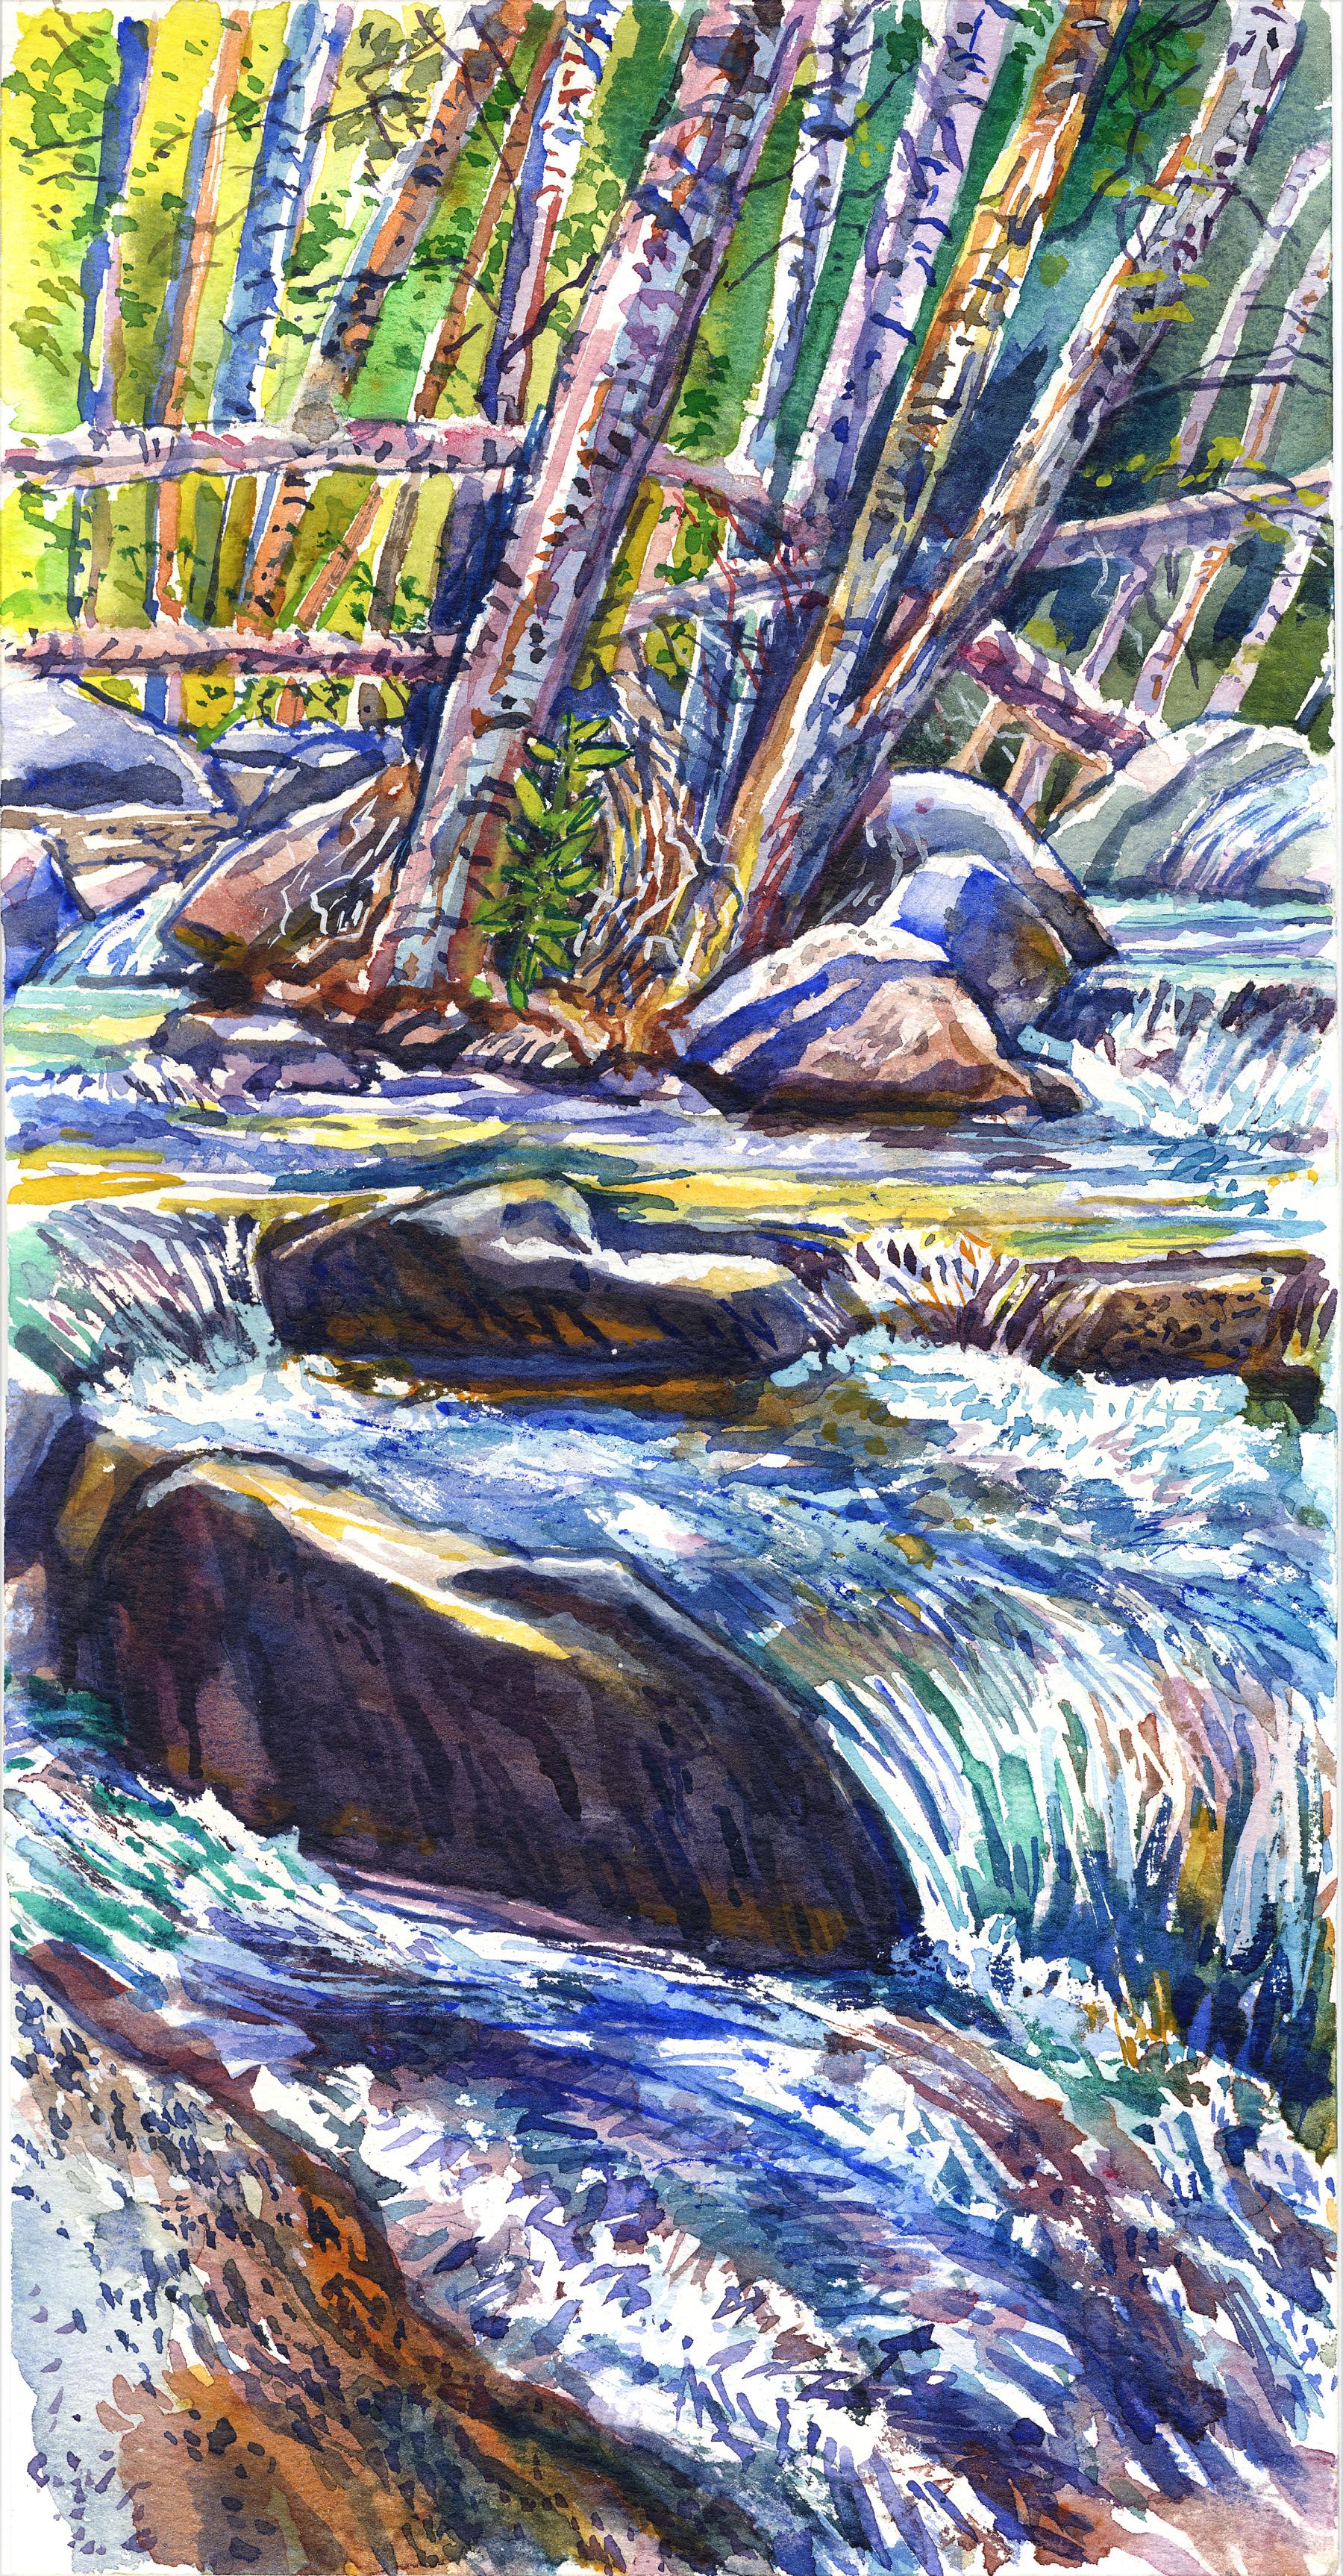 Baldy Cascade Flood Boulders